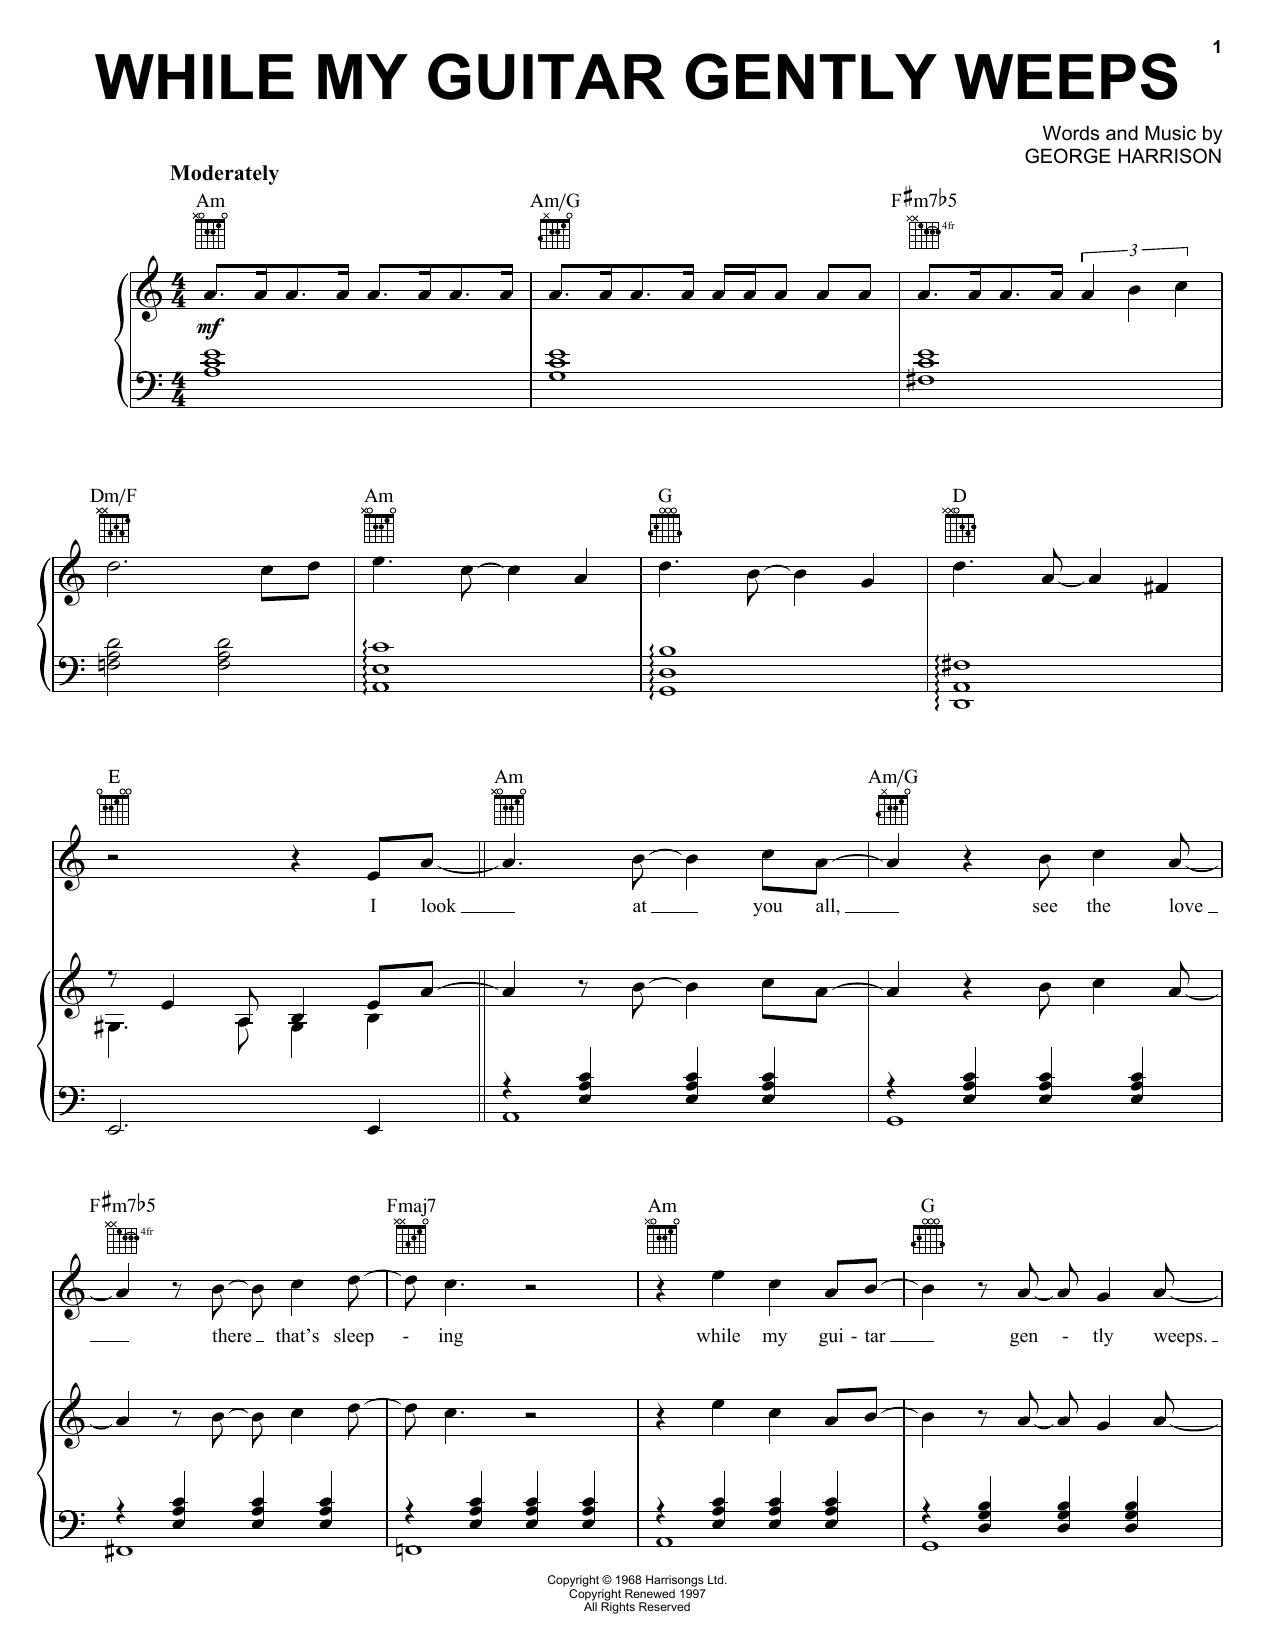 While my guitar gently weeps tab pdf